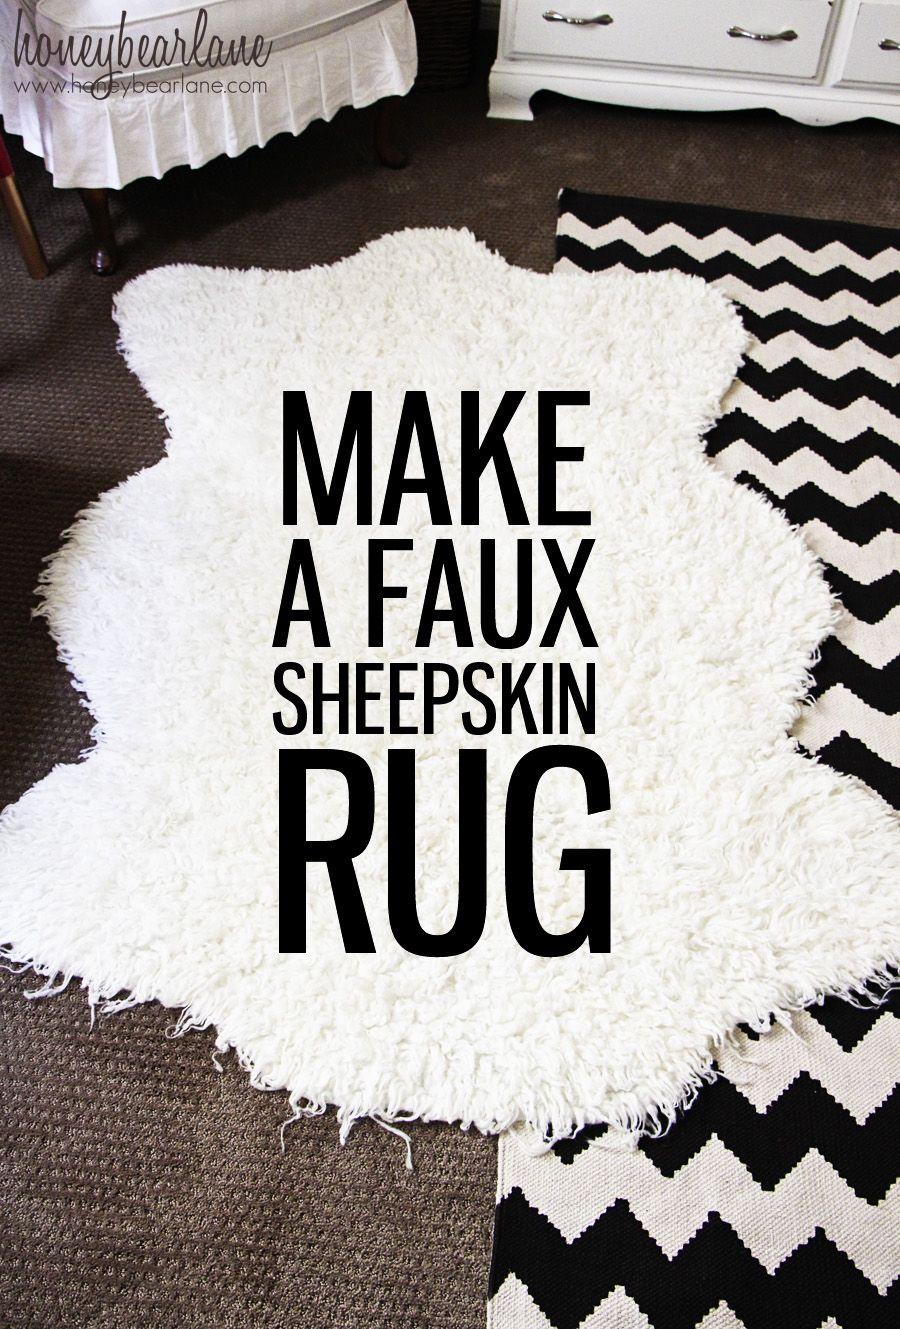 Make A Faux Sheepskin Rug Faux Sheepskin Rug Super Easy And Room - Cowhide and sheepskin rugs bathroom